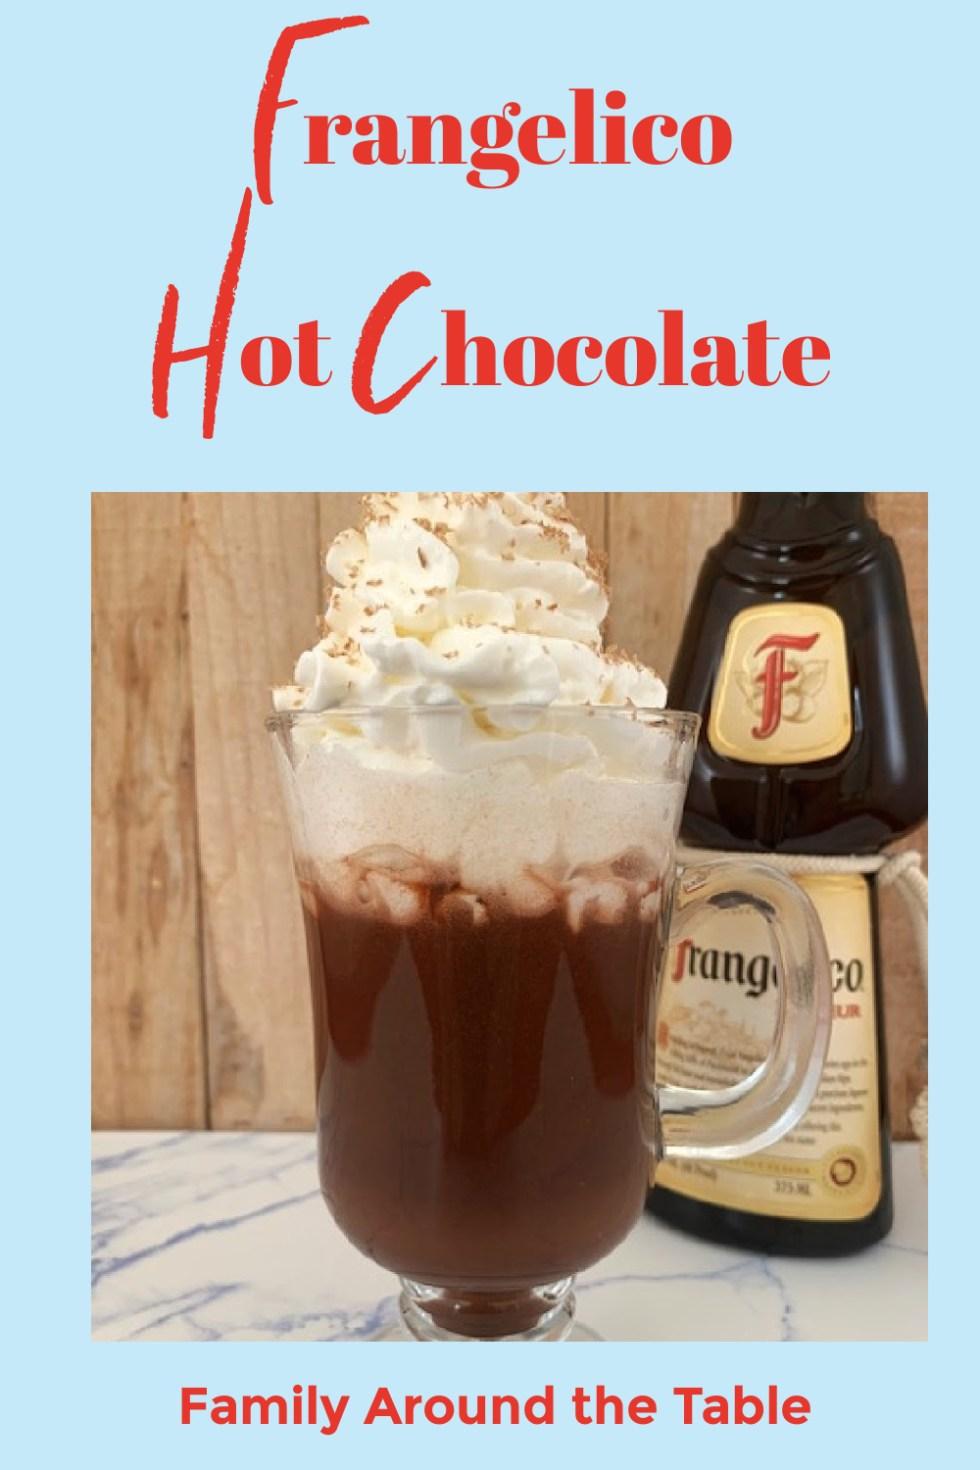 Frangelico Hot Chocolate Pinterest image.